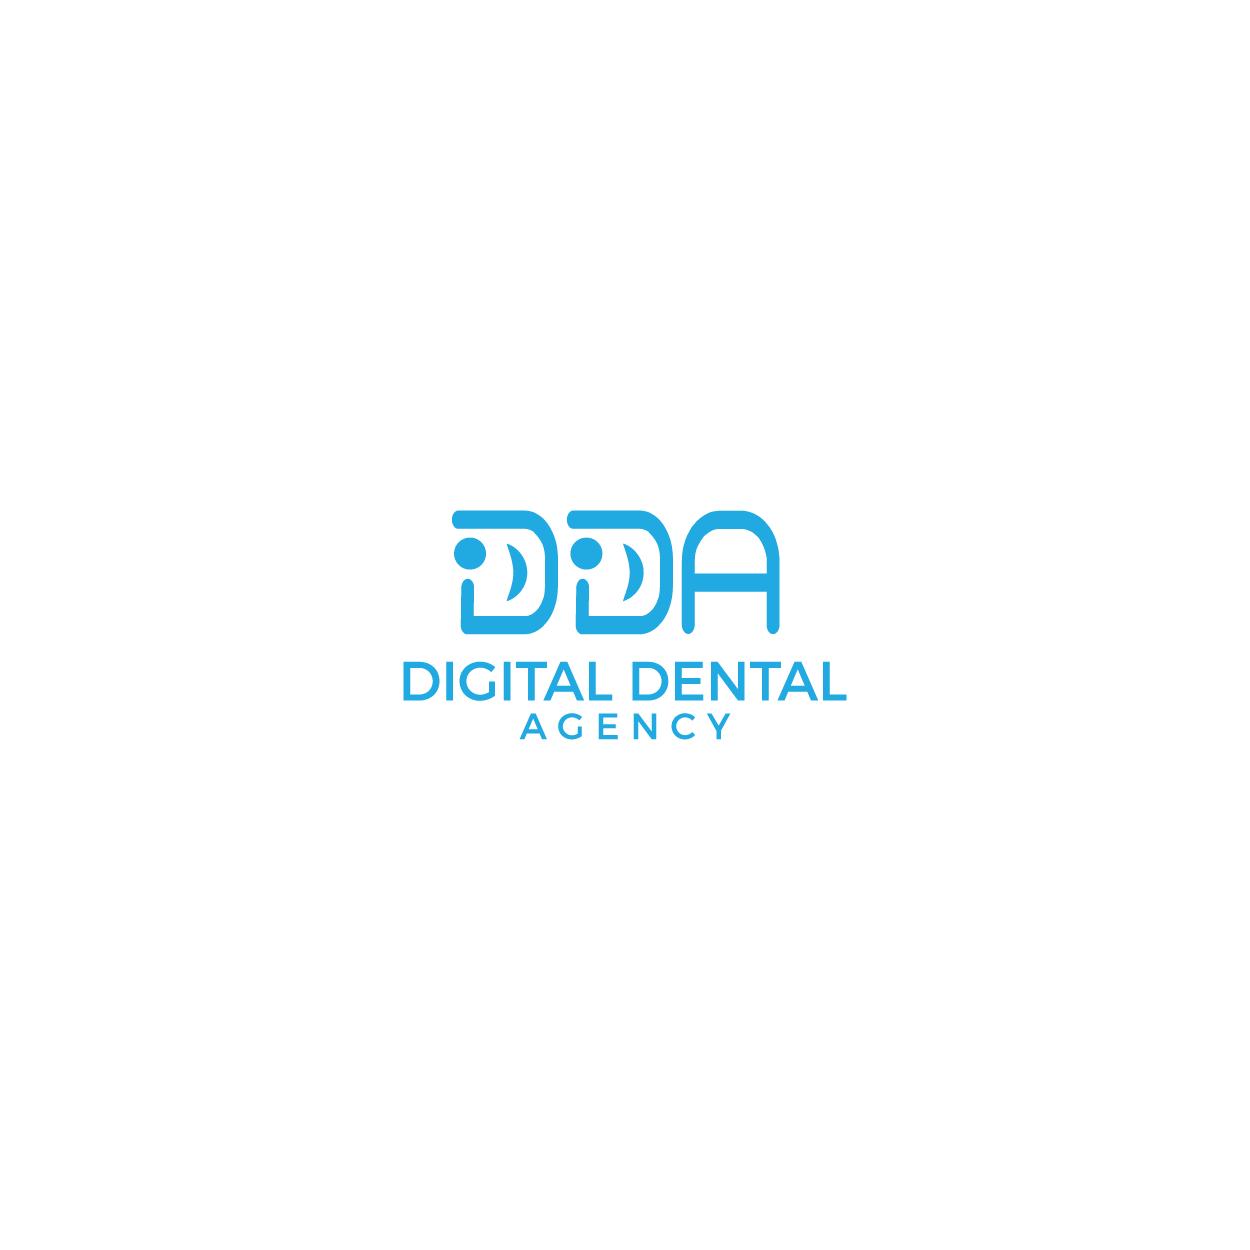 Logo Design by 354studio - Entry No. 23 in the Logo Design Contest Imaginative Logo Design for Digital Dental Agency.